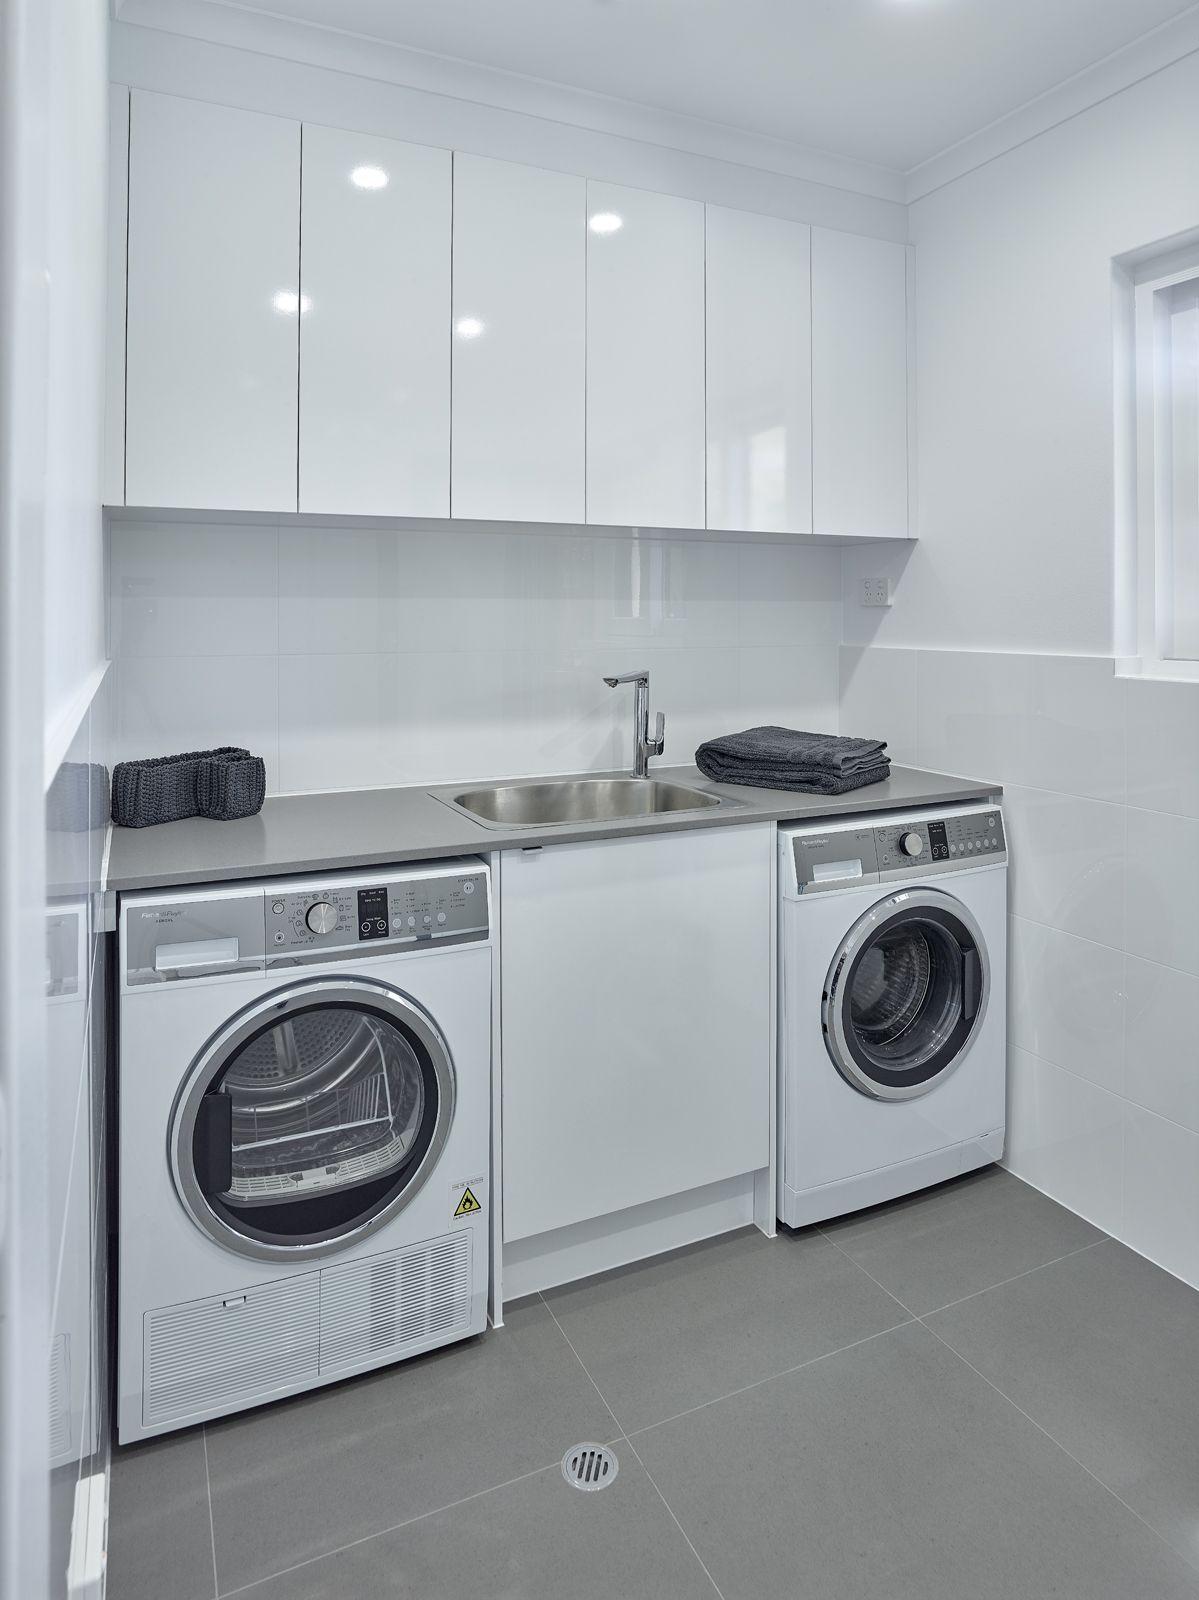 Simple Yet Versatile Laundry Design Brilliantsa Laundry Renovation Washinmachine Dryer Sink Troug Laundry Room Design Laundry Design Laundry Room Decor